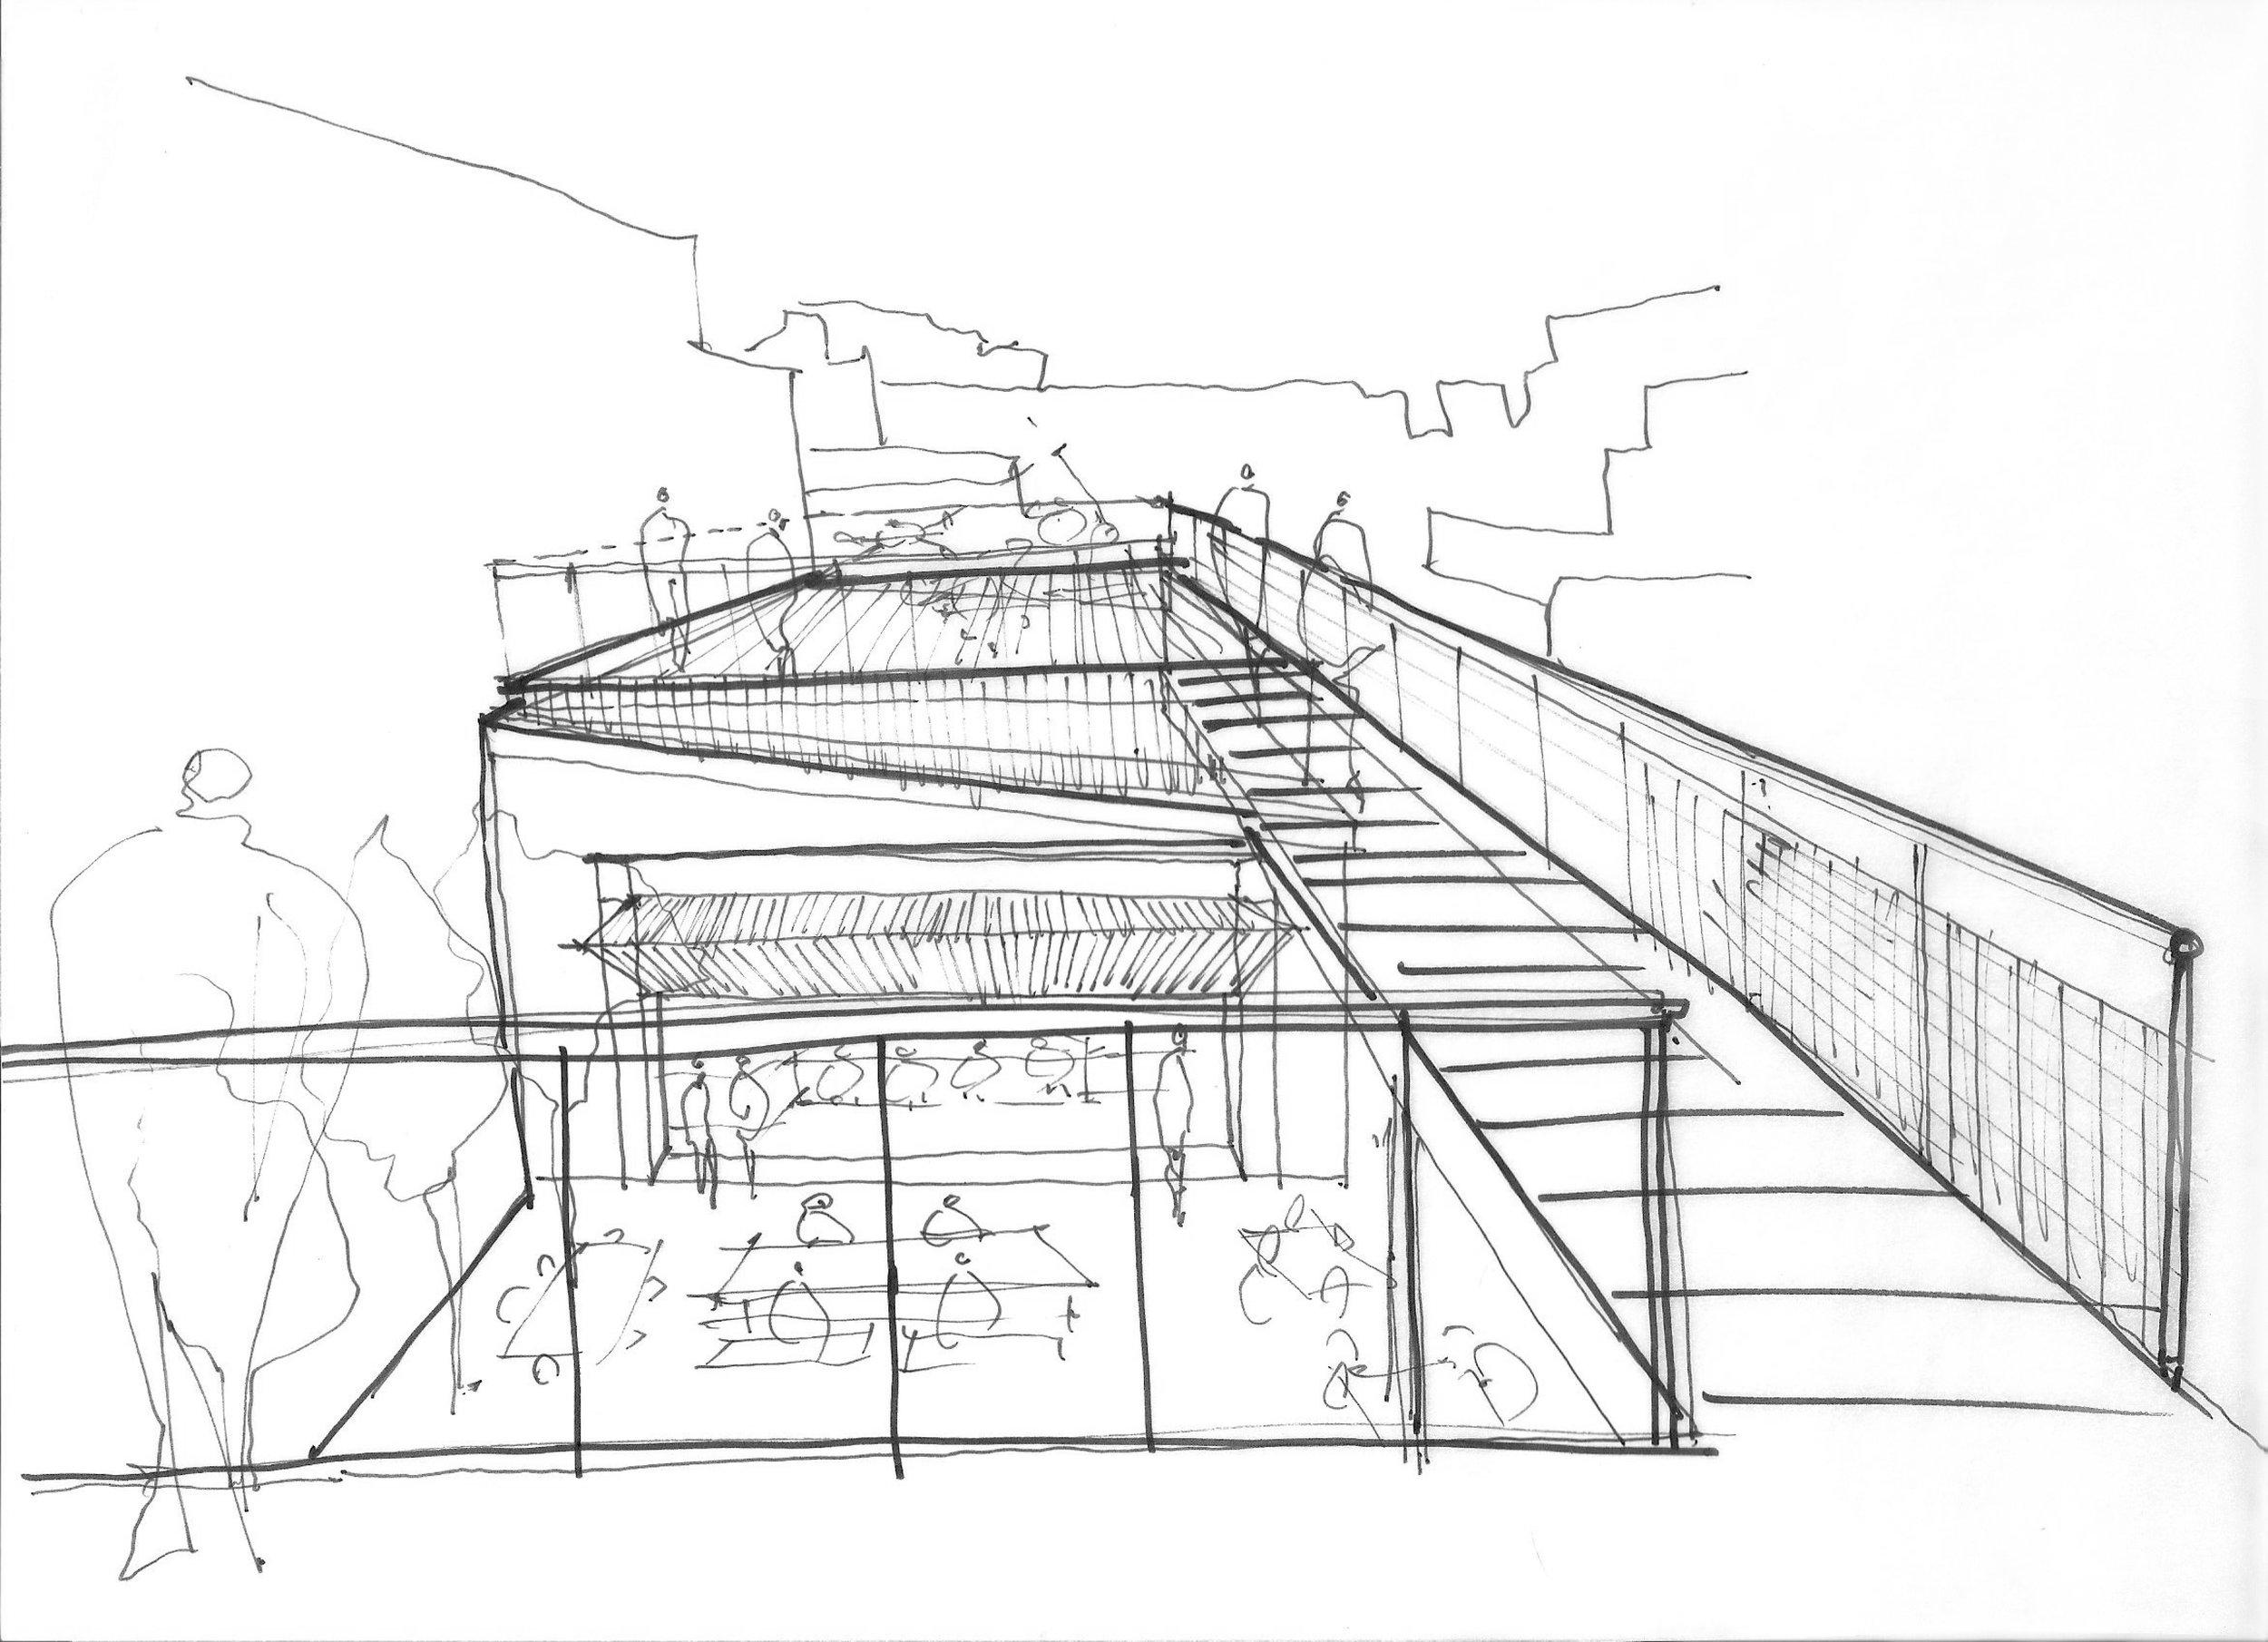 studio-saint-bars-and-restaurants-maketto-washington-dc-sketch-7